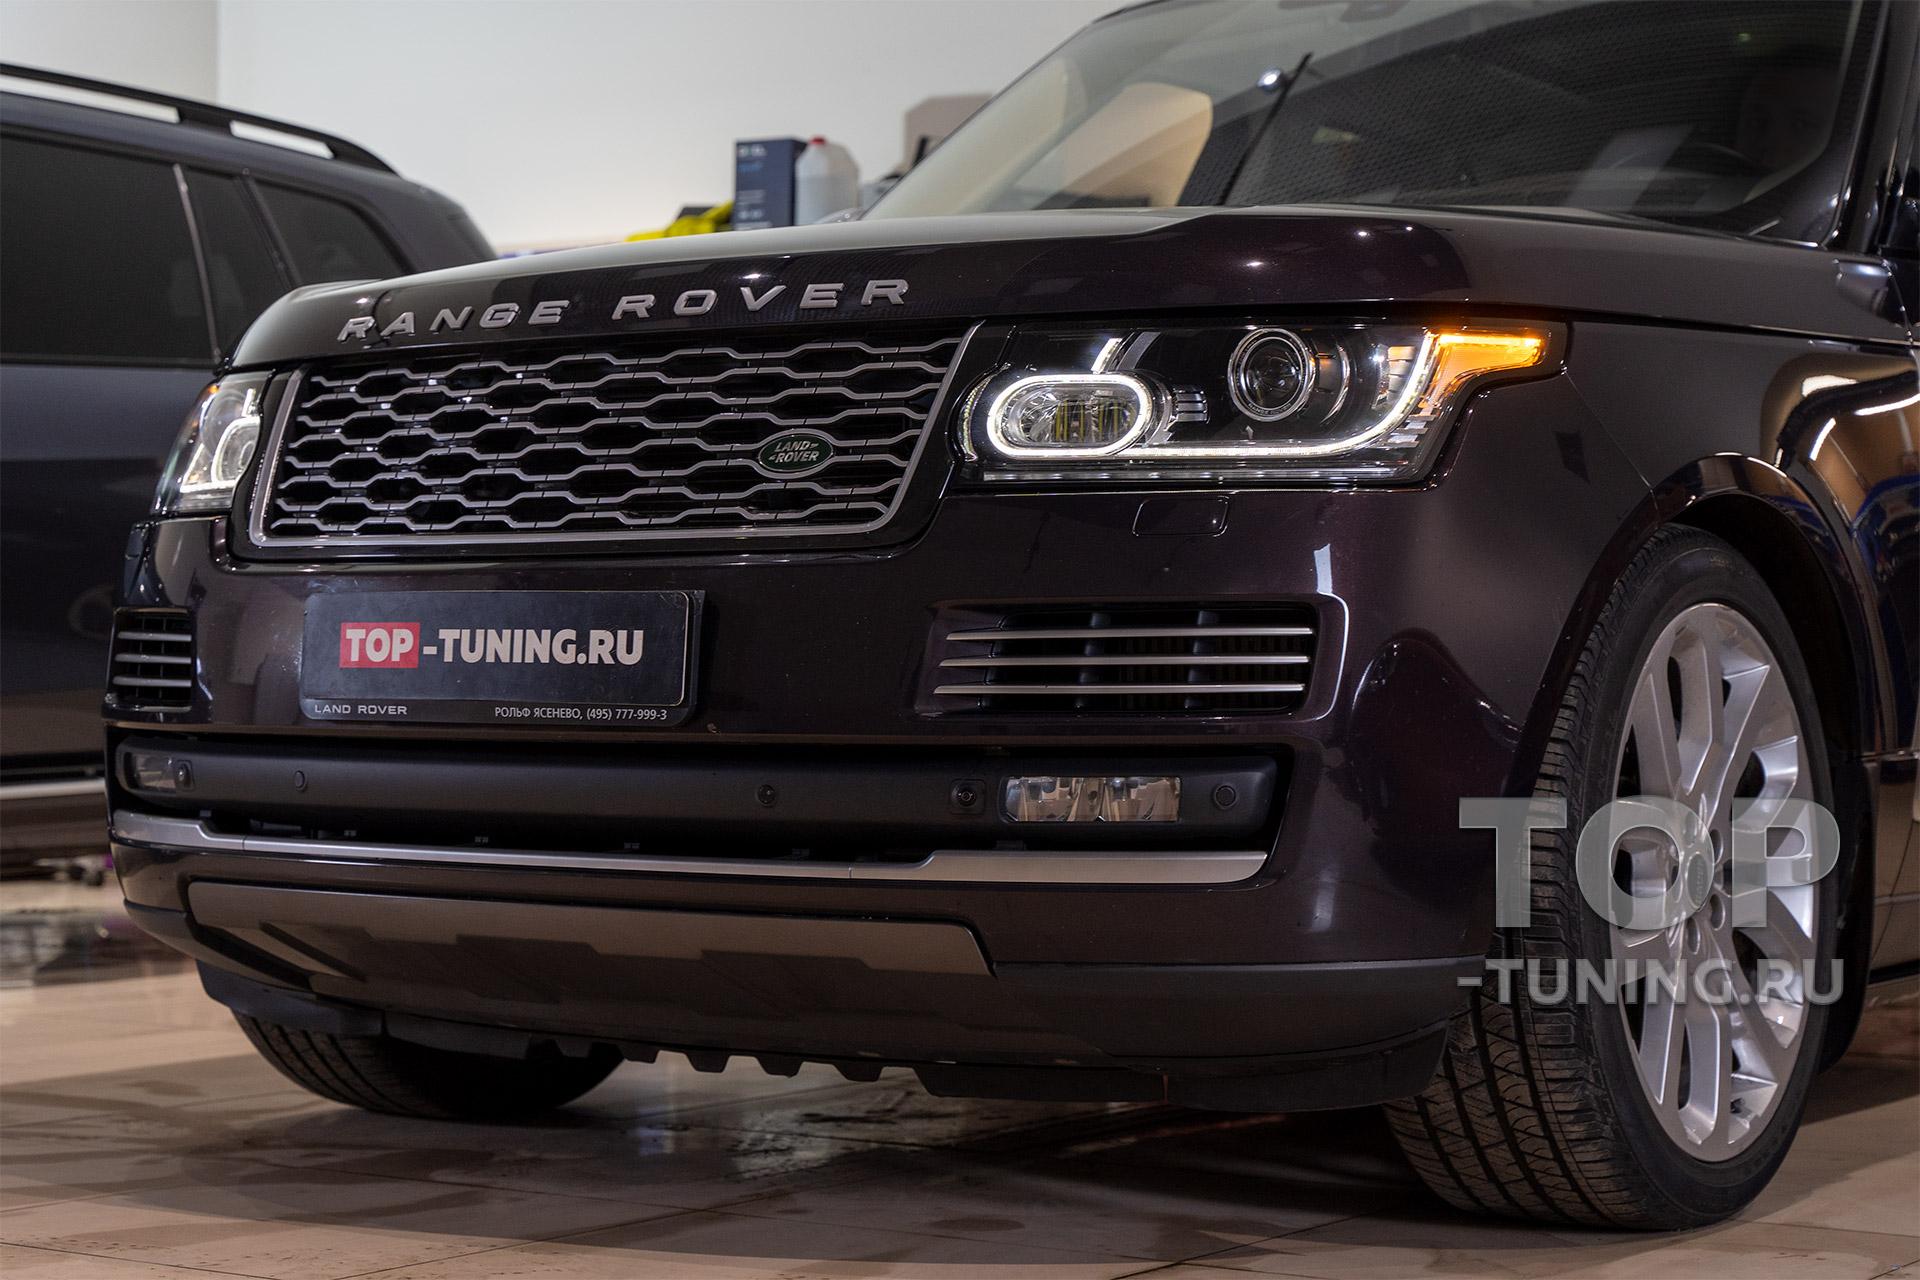 Тюнинг фар Range Rover Vogue SE 4 - Установка Би ЛЕД линз в штатную оптику